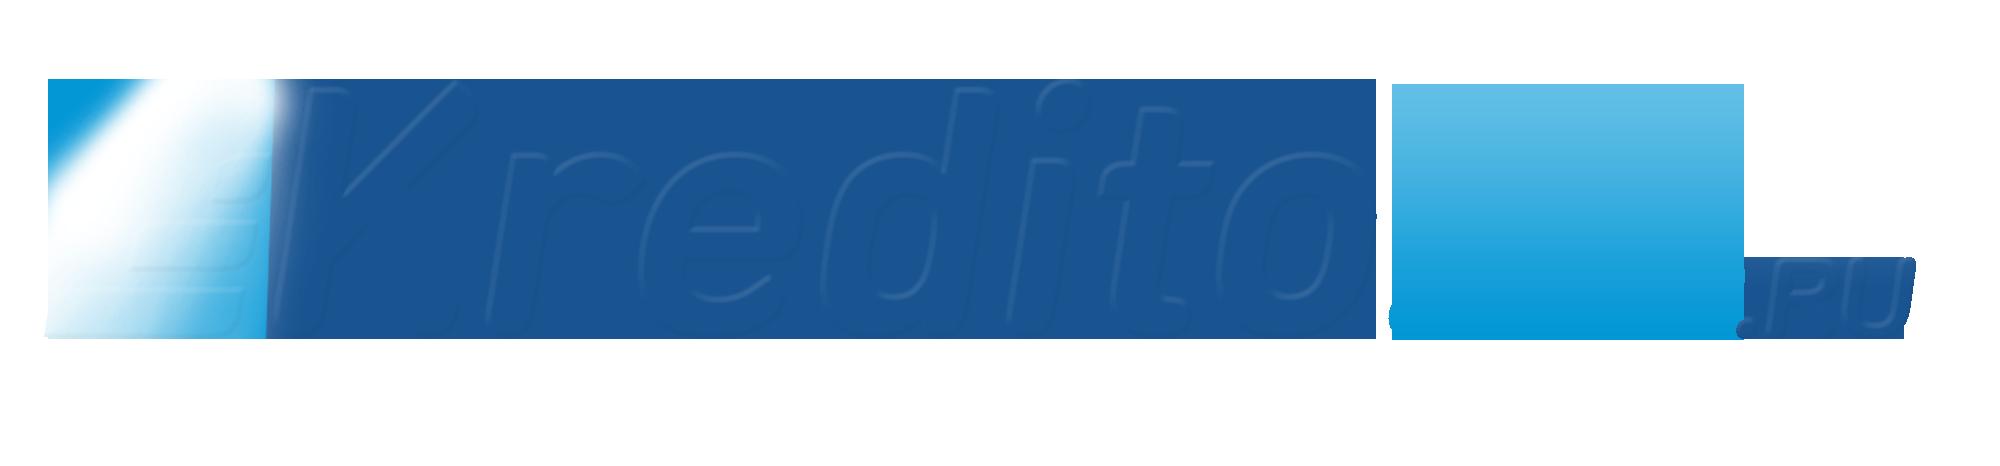 Kredito24. Ru выдал онлайн займов на сумму более 1 млрд рублей